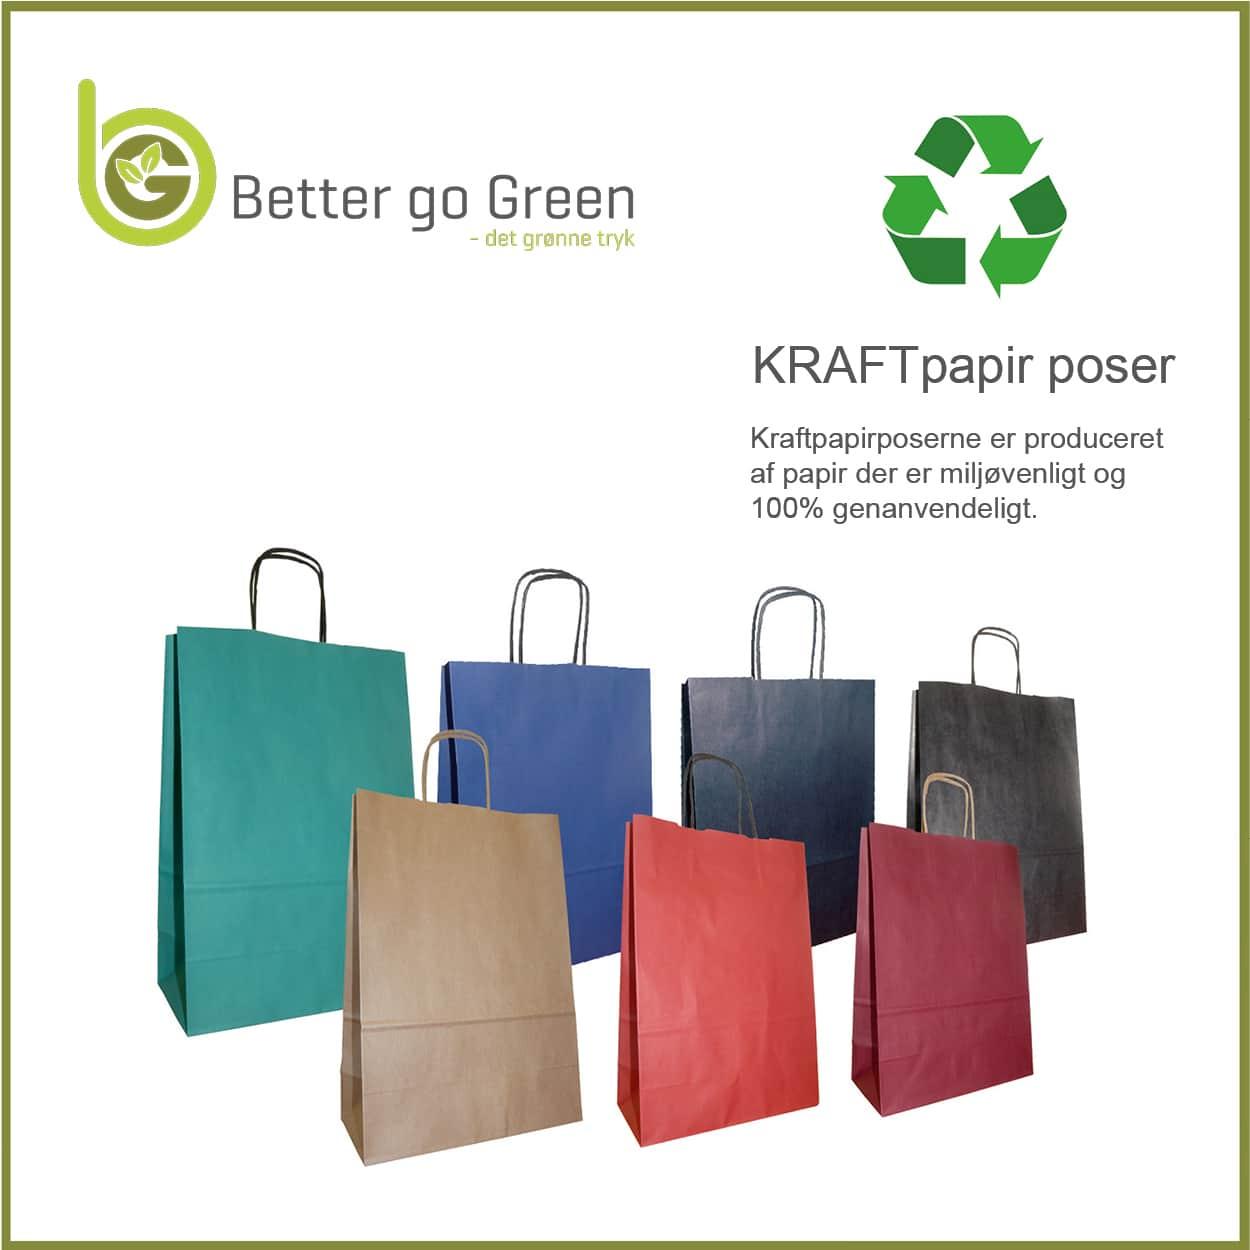 Miljørigtige kulørte papirposer med logo tryk, få dem hos BetterGoGreen.dk